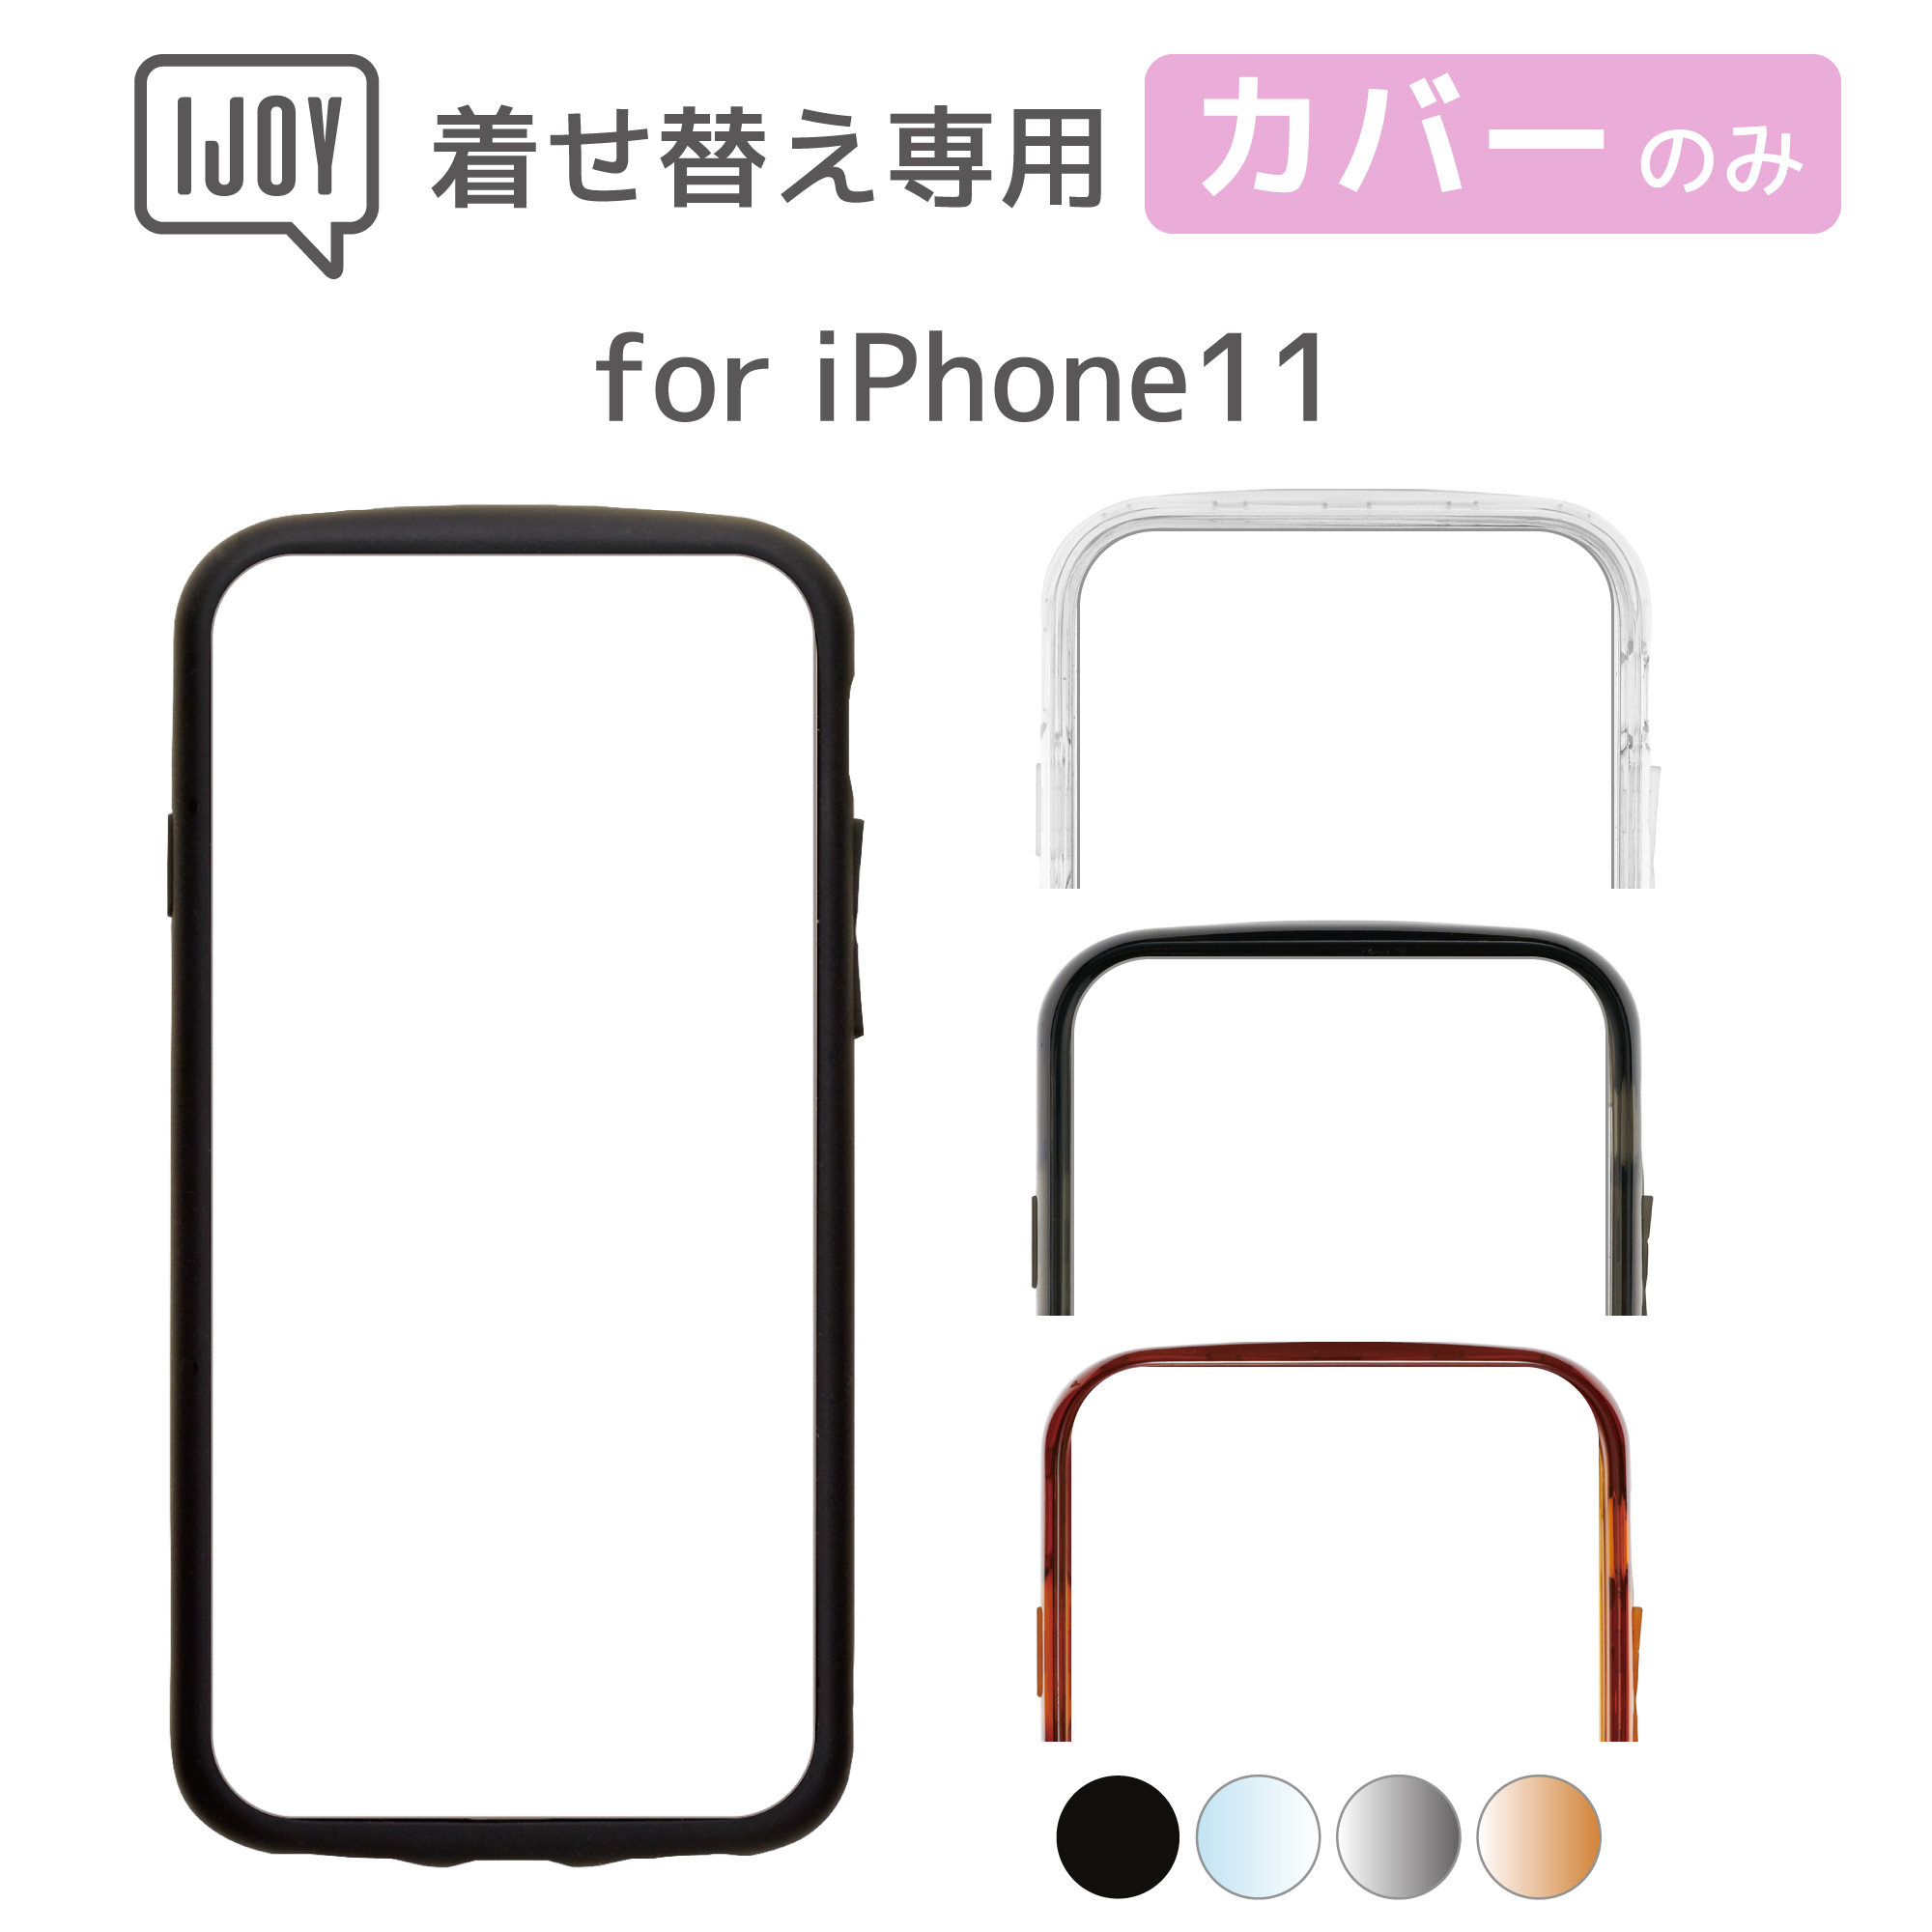 iPhone11 IJOY フレーム 送料0円 着せ替え 衝撃保護 フロントパーツ カラーバリエーション 単品 新商品